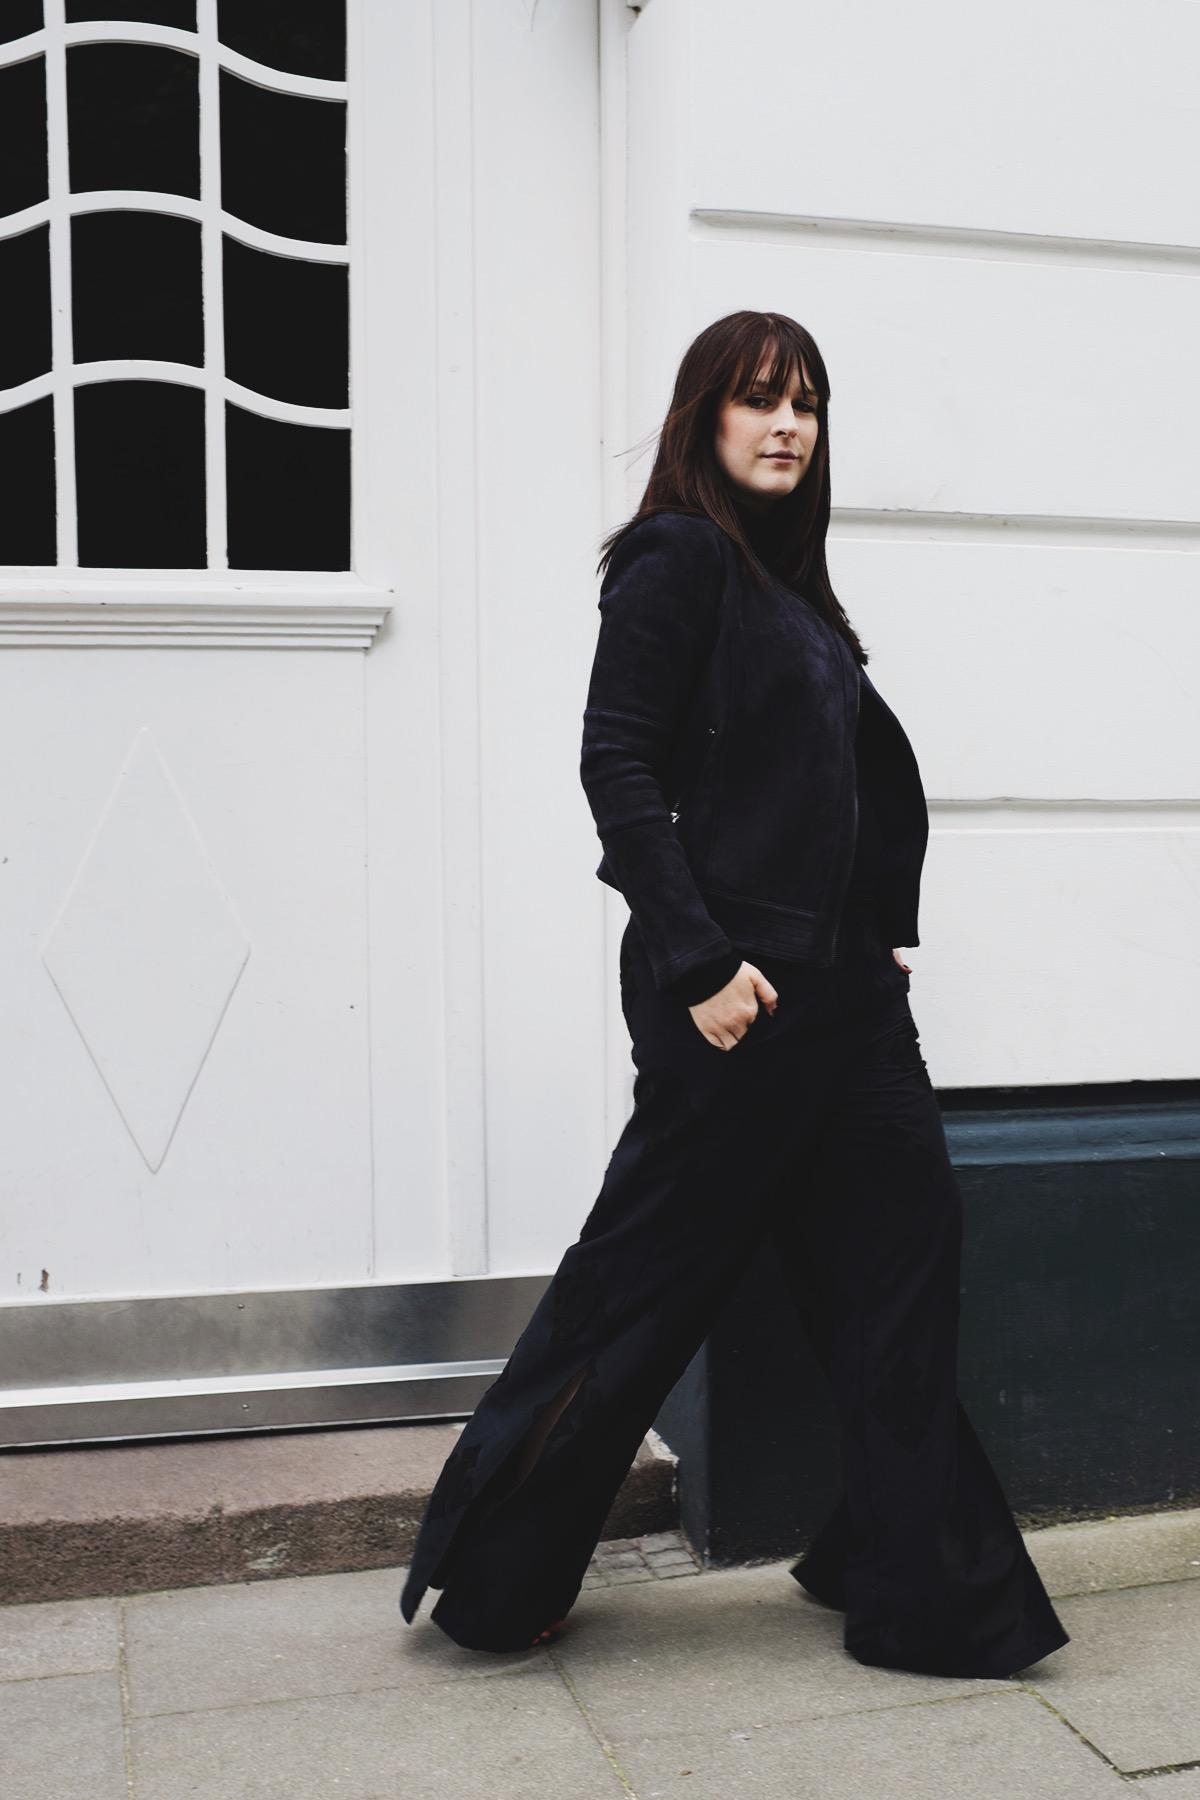 ana frost fashionblogger hamburg fafine all black outfit